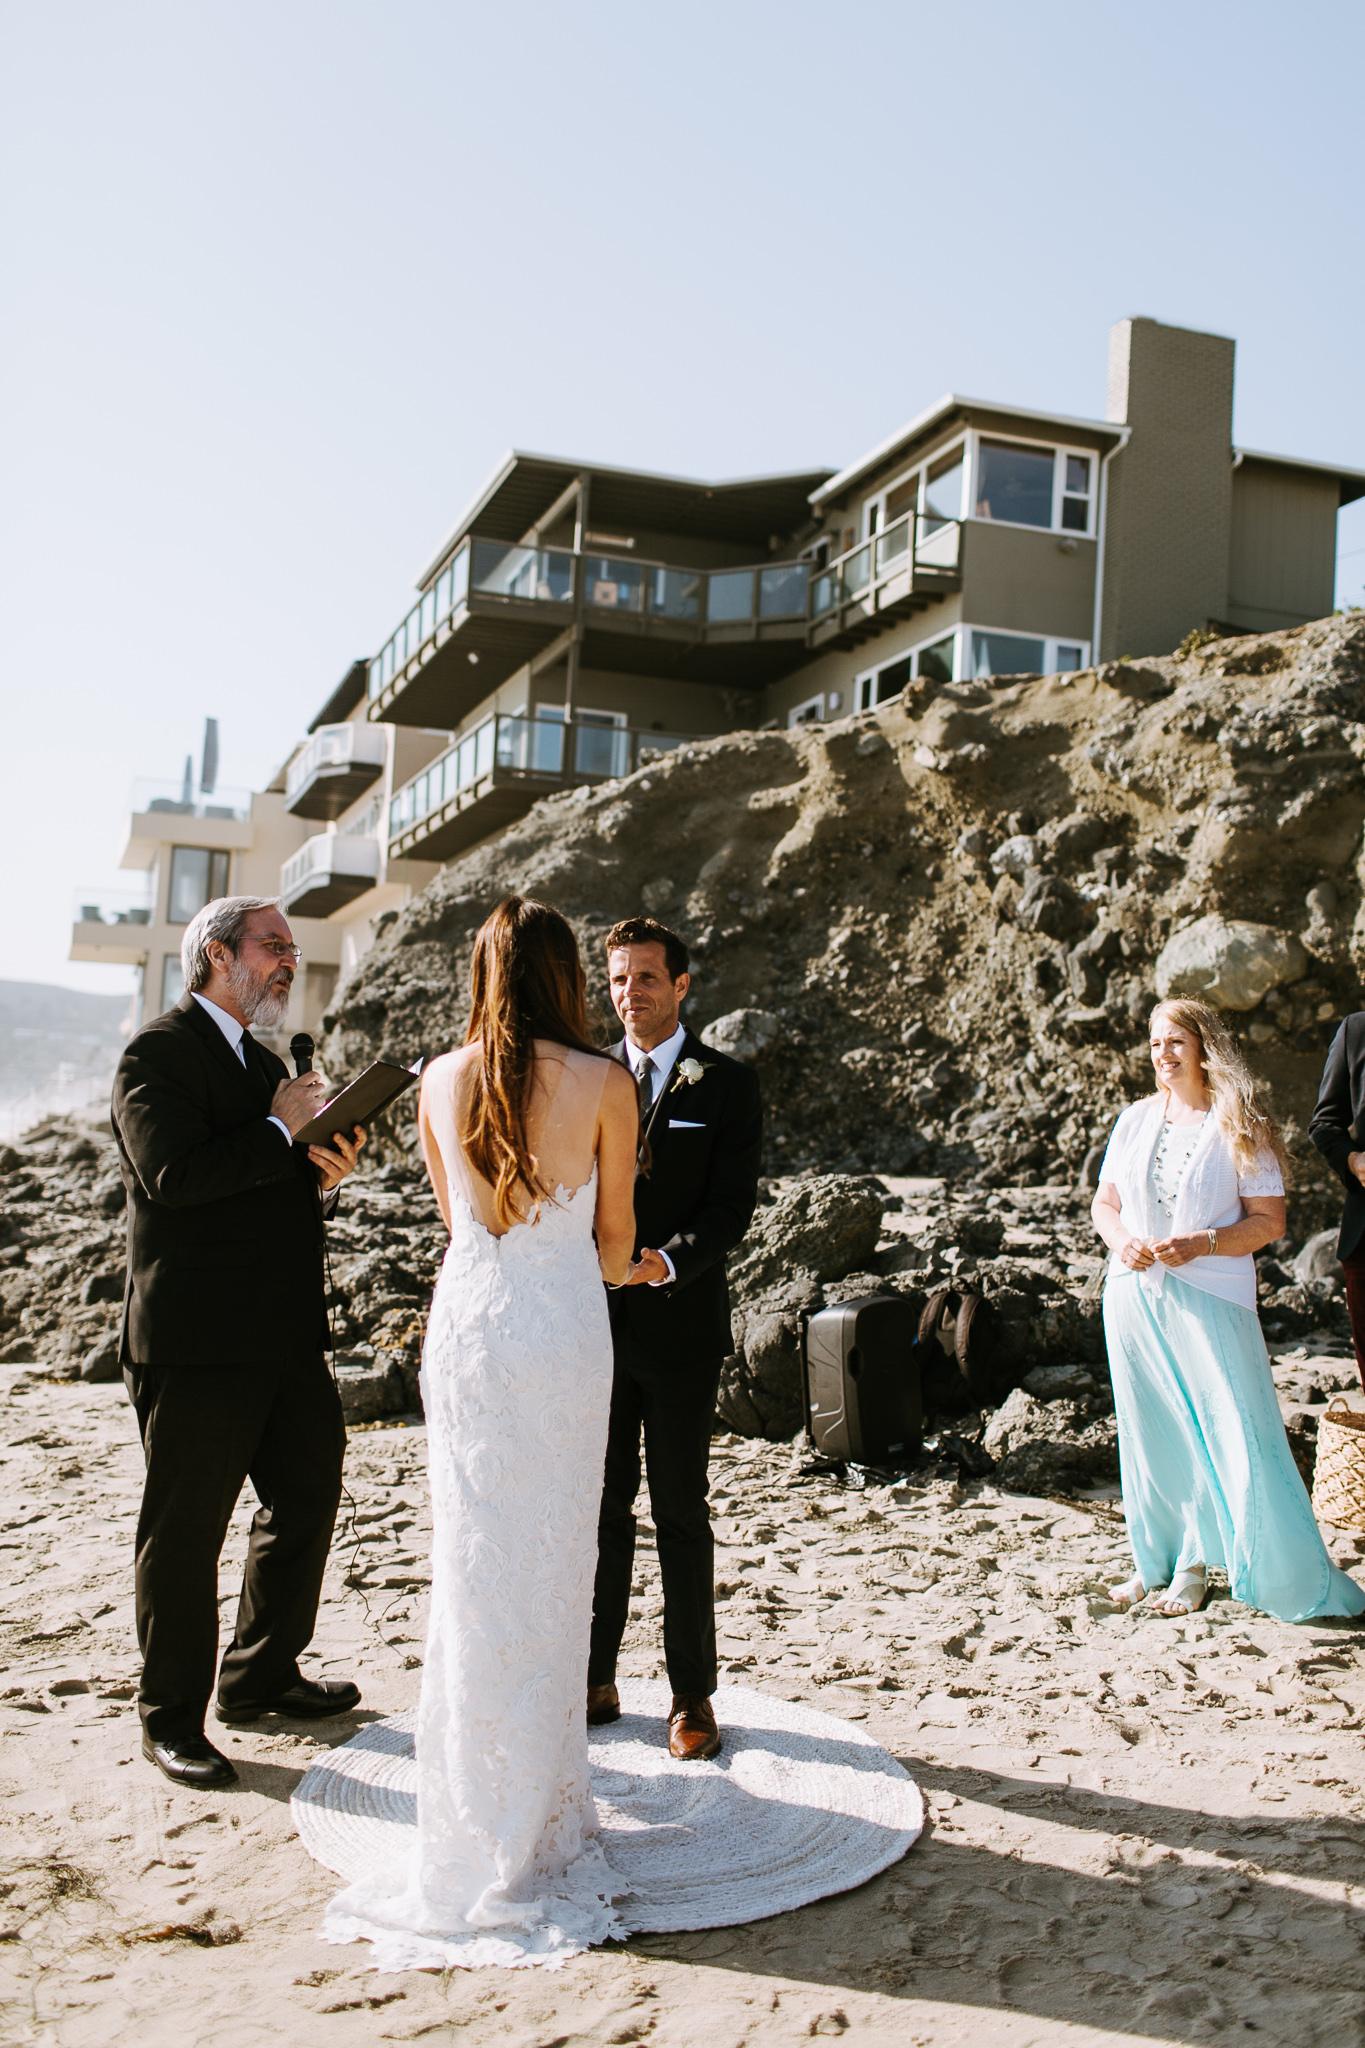 LagunaBeach-WeddingPhotographer-32.jpg